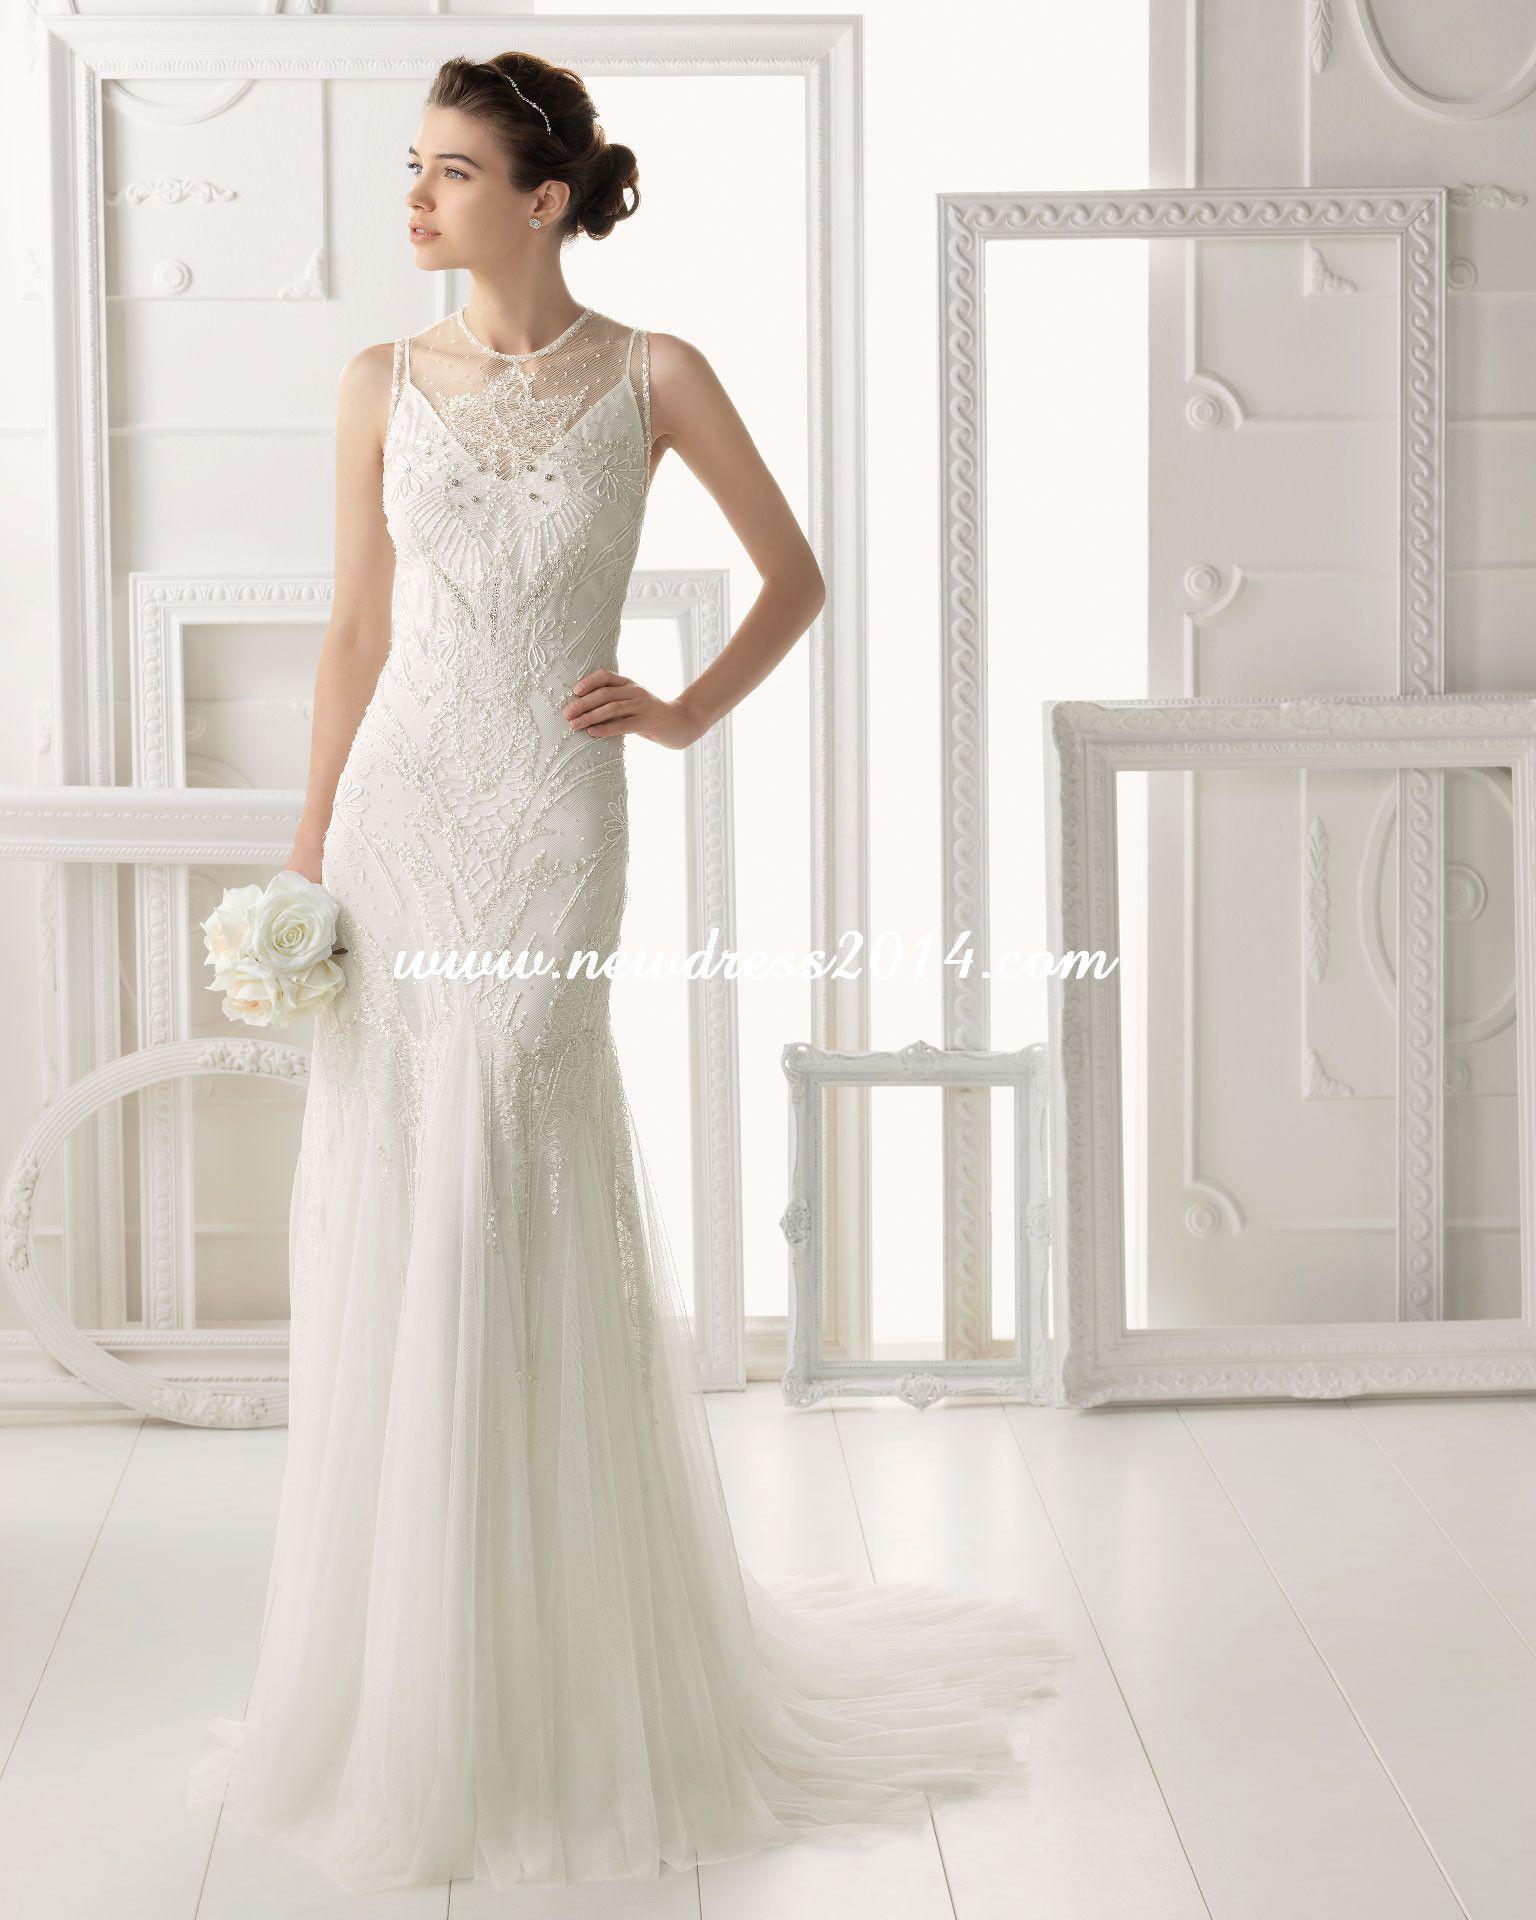 Wedding dress wedding dress wedding ideasmeday maybe